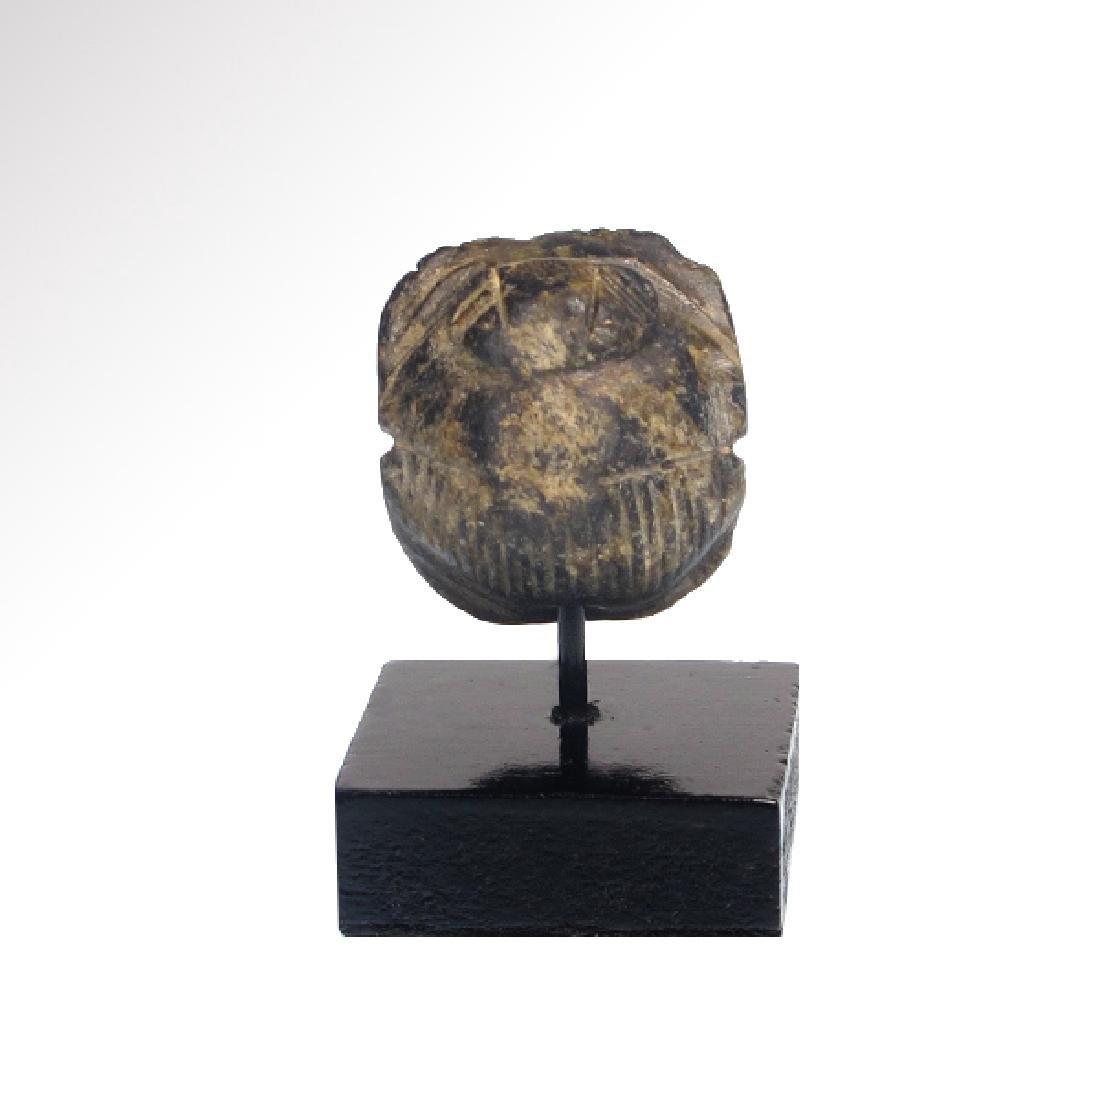 Egyptian Steatite Heart Scarab, c. 600 B.C. - 2